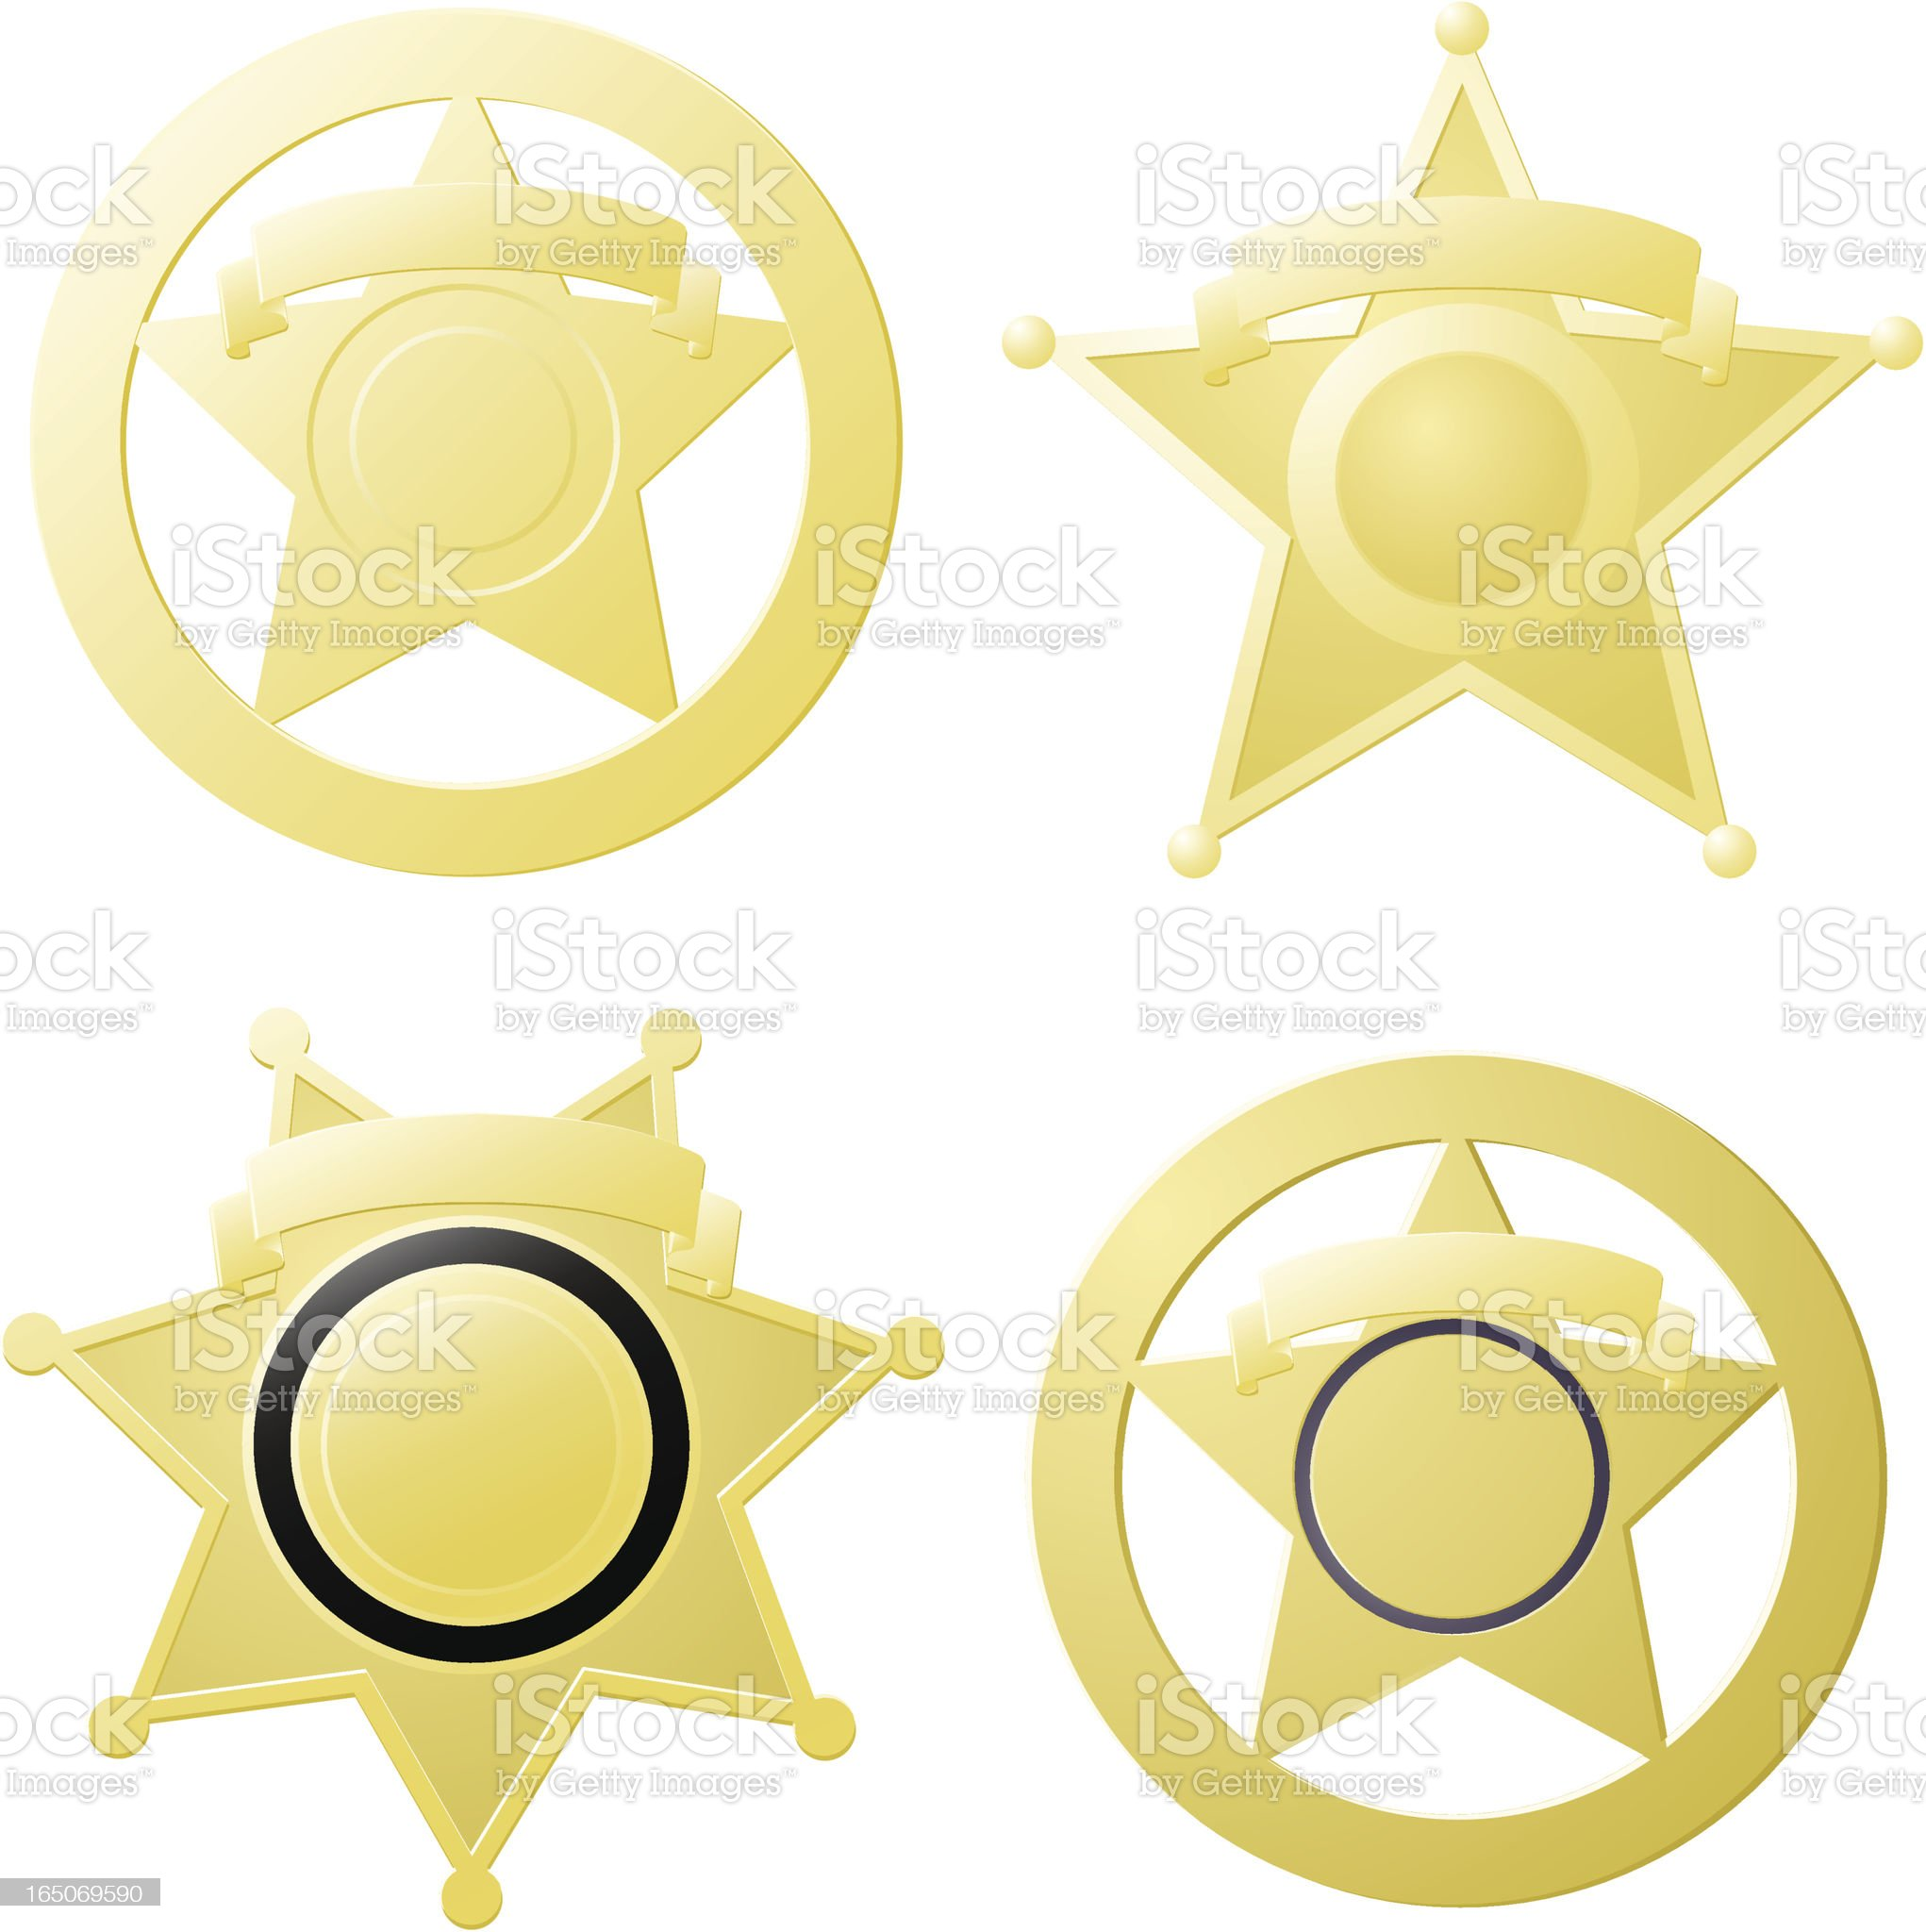 The Ol' Tin Star royalty-free stock vector art